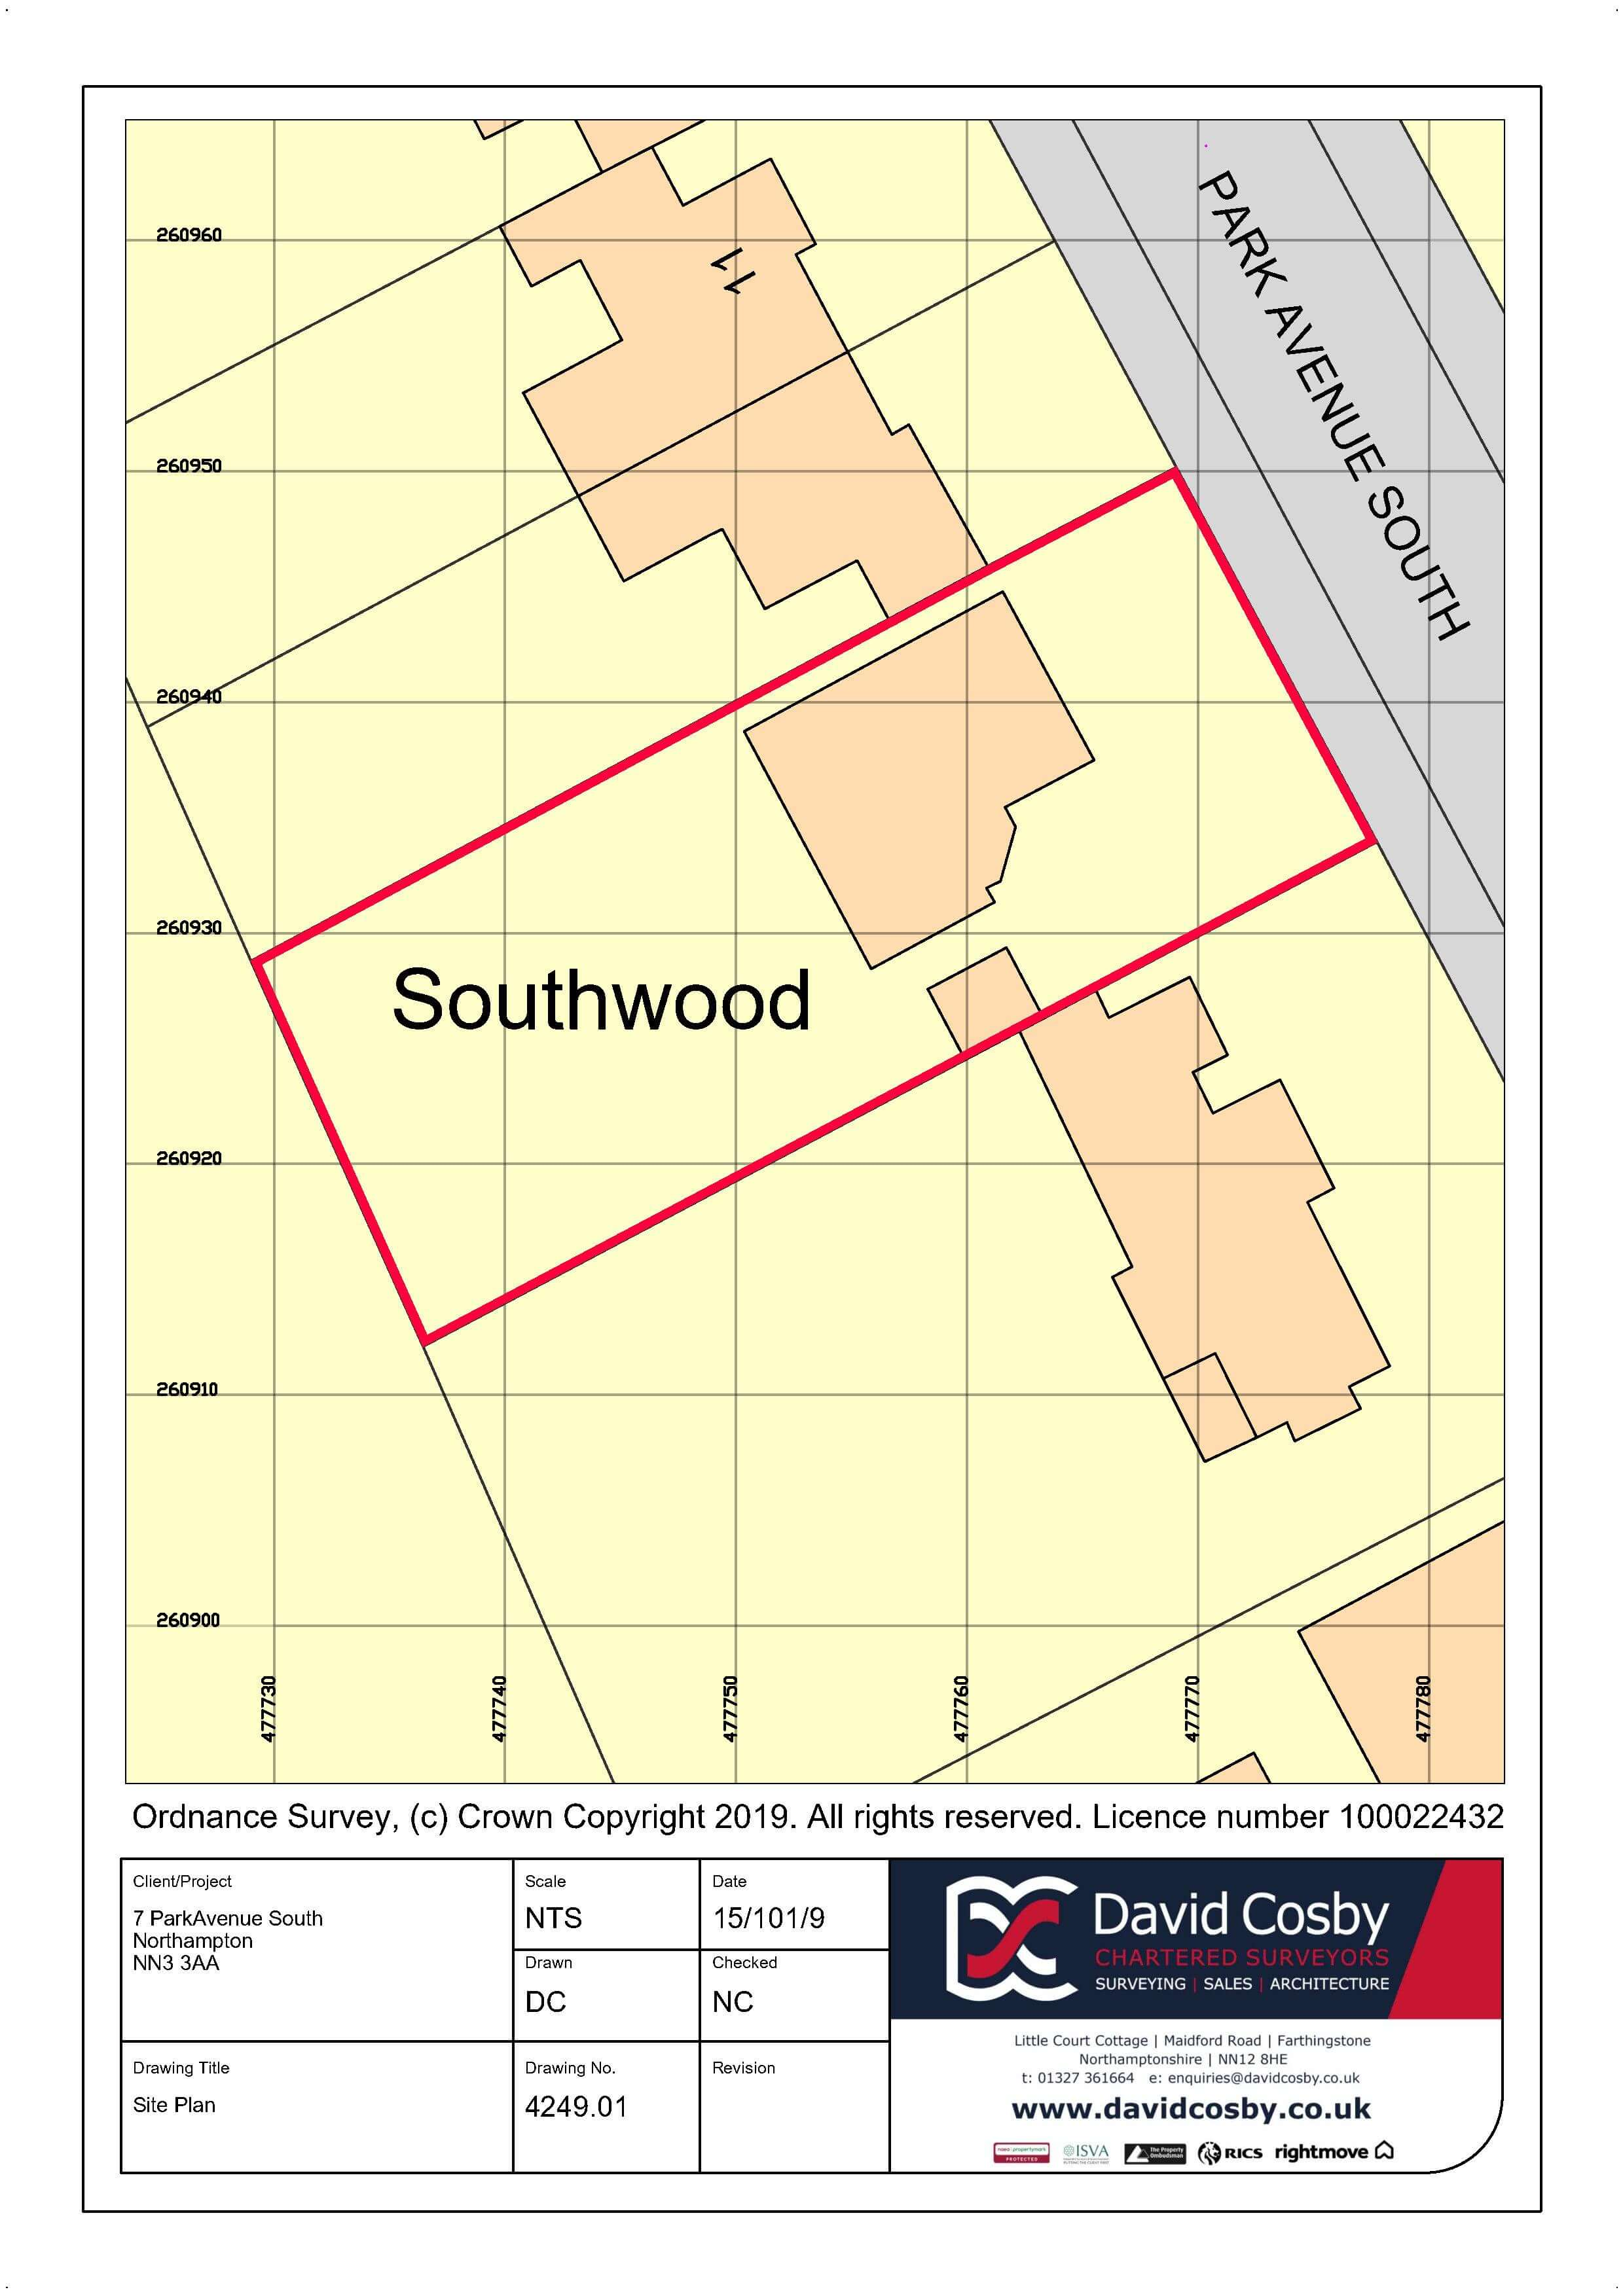 David Cosby Chartered Surveyors & Estate Agents - Southwood Northampton - SITE PLAN IMAGE